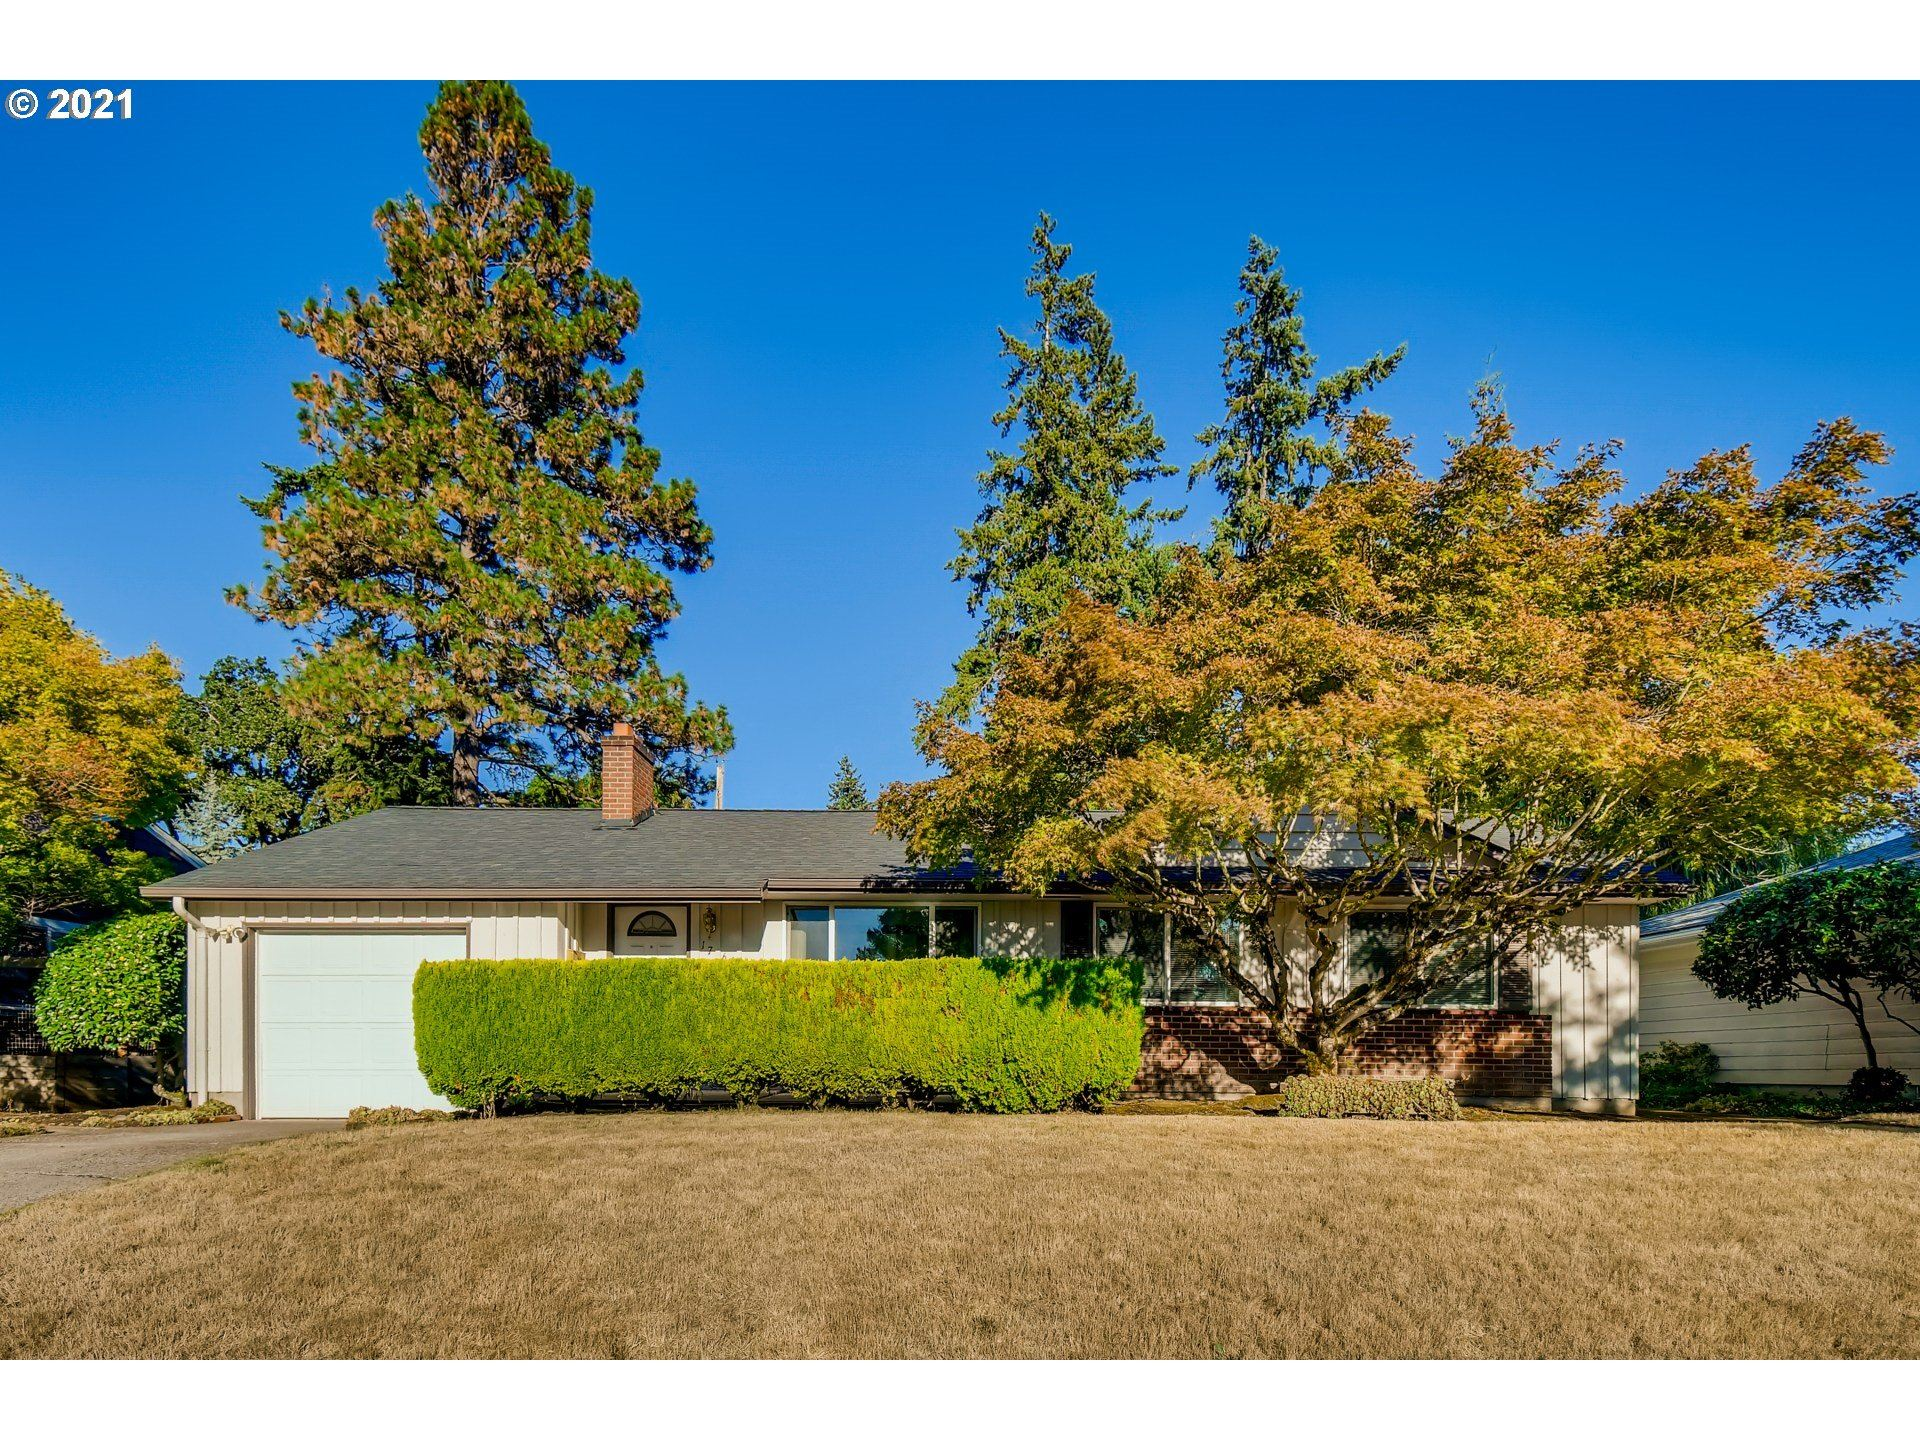 1760 SW WELLINGTON AVE, Portland, OR 97225 - MLS#: 21559867